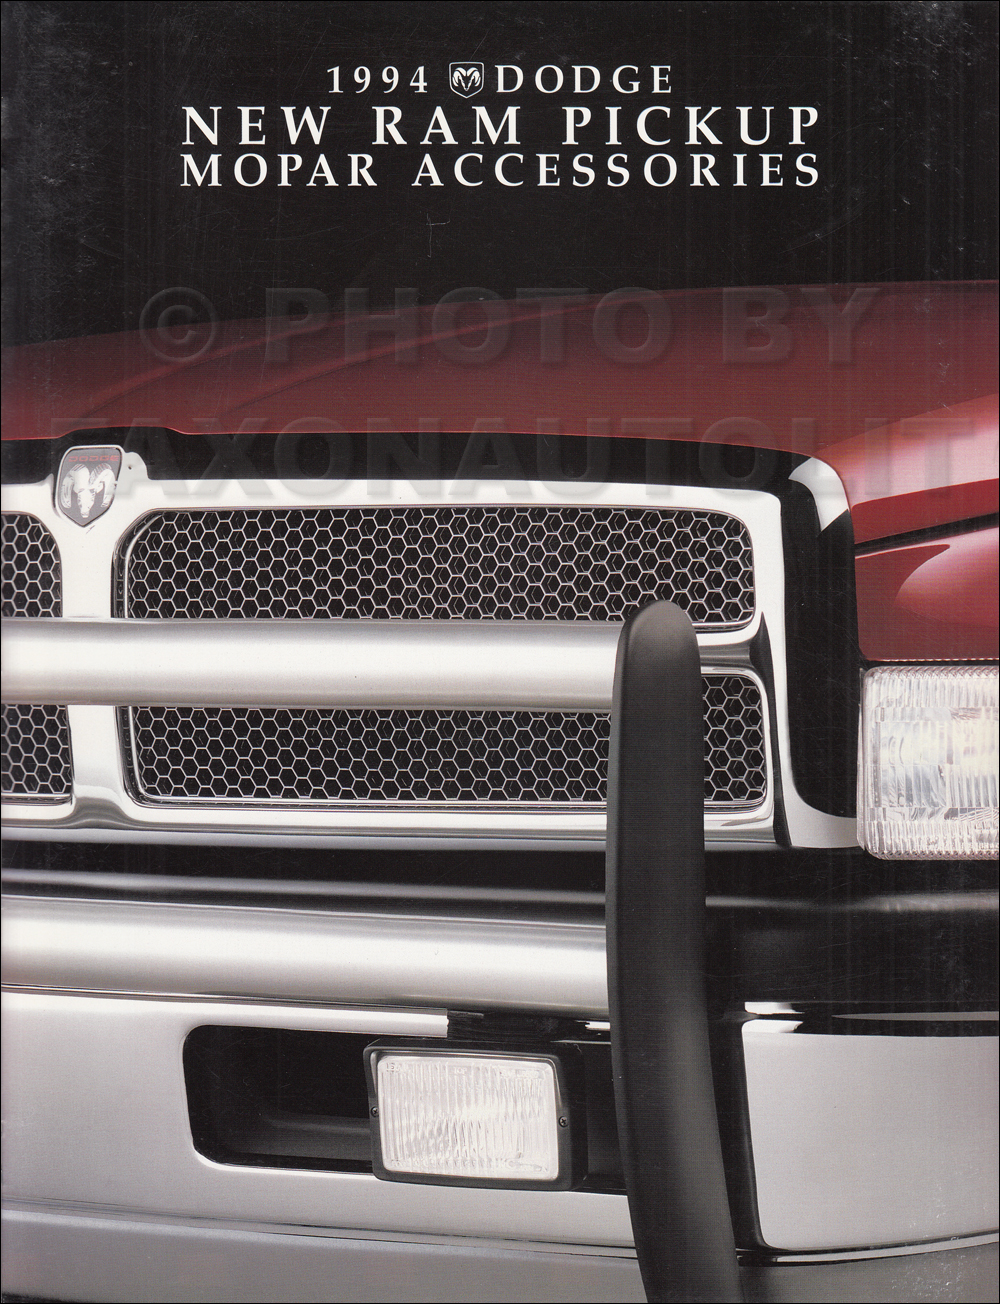 1967 Cadillac Accessory Book Original